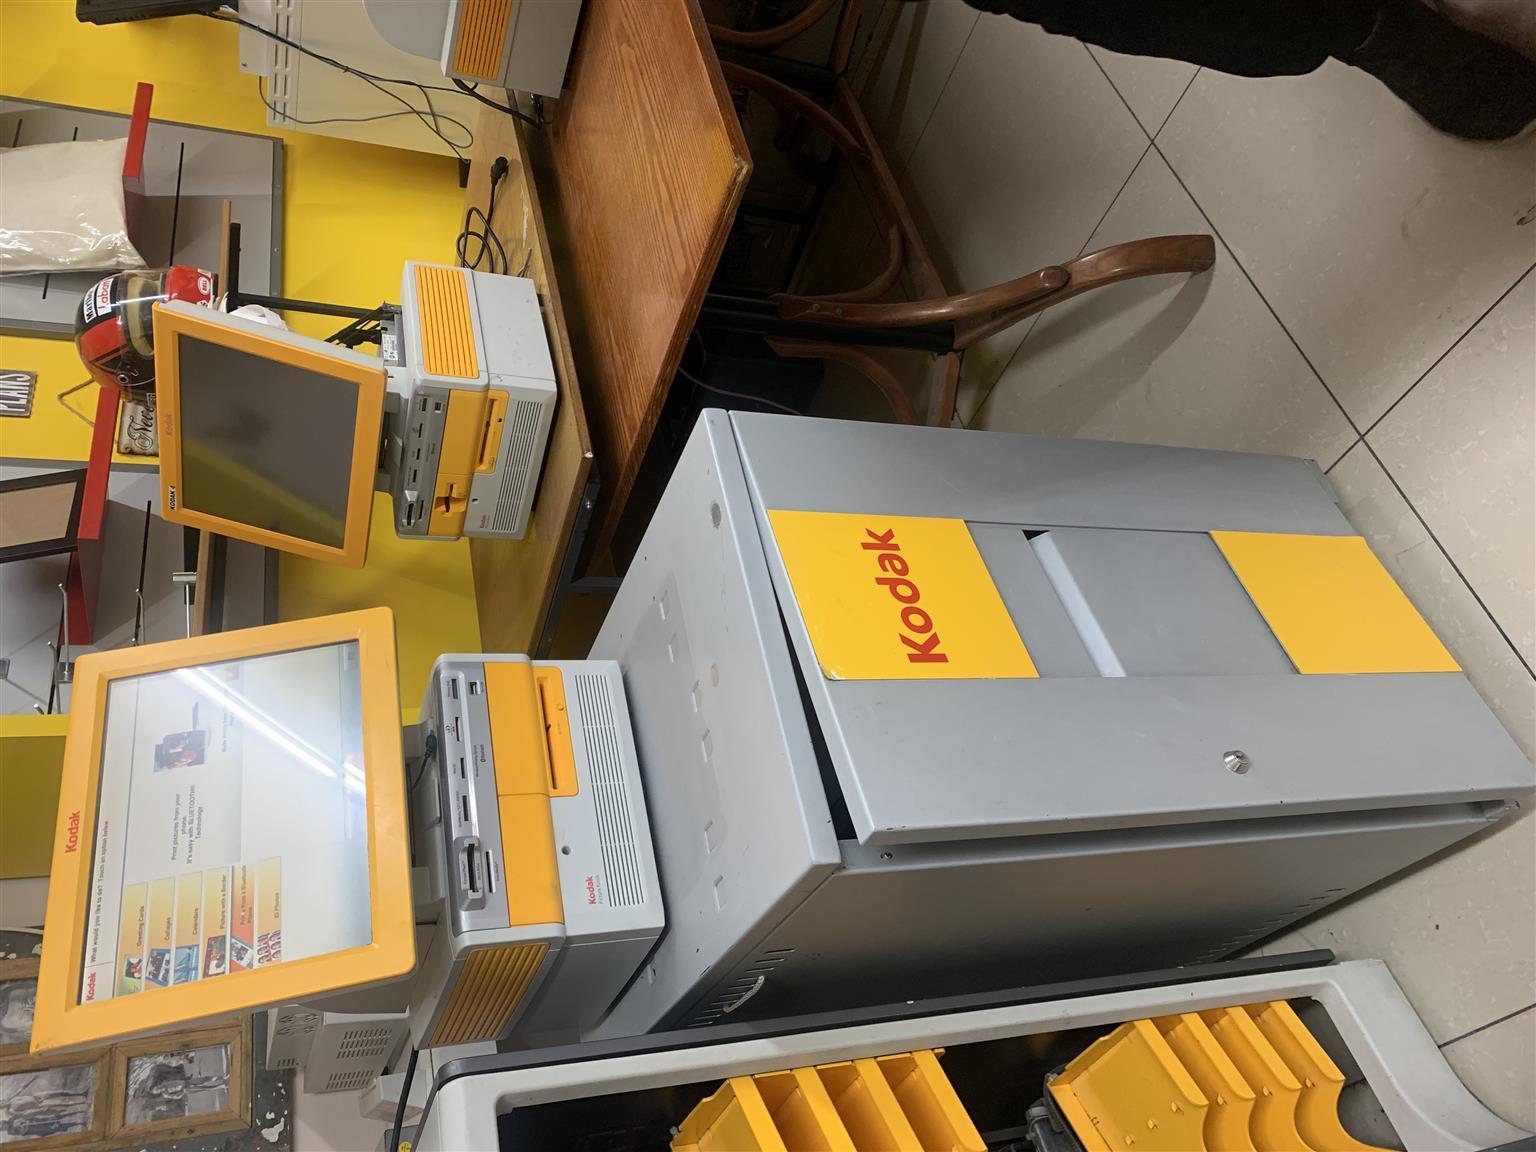 Kodak Printer for sale